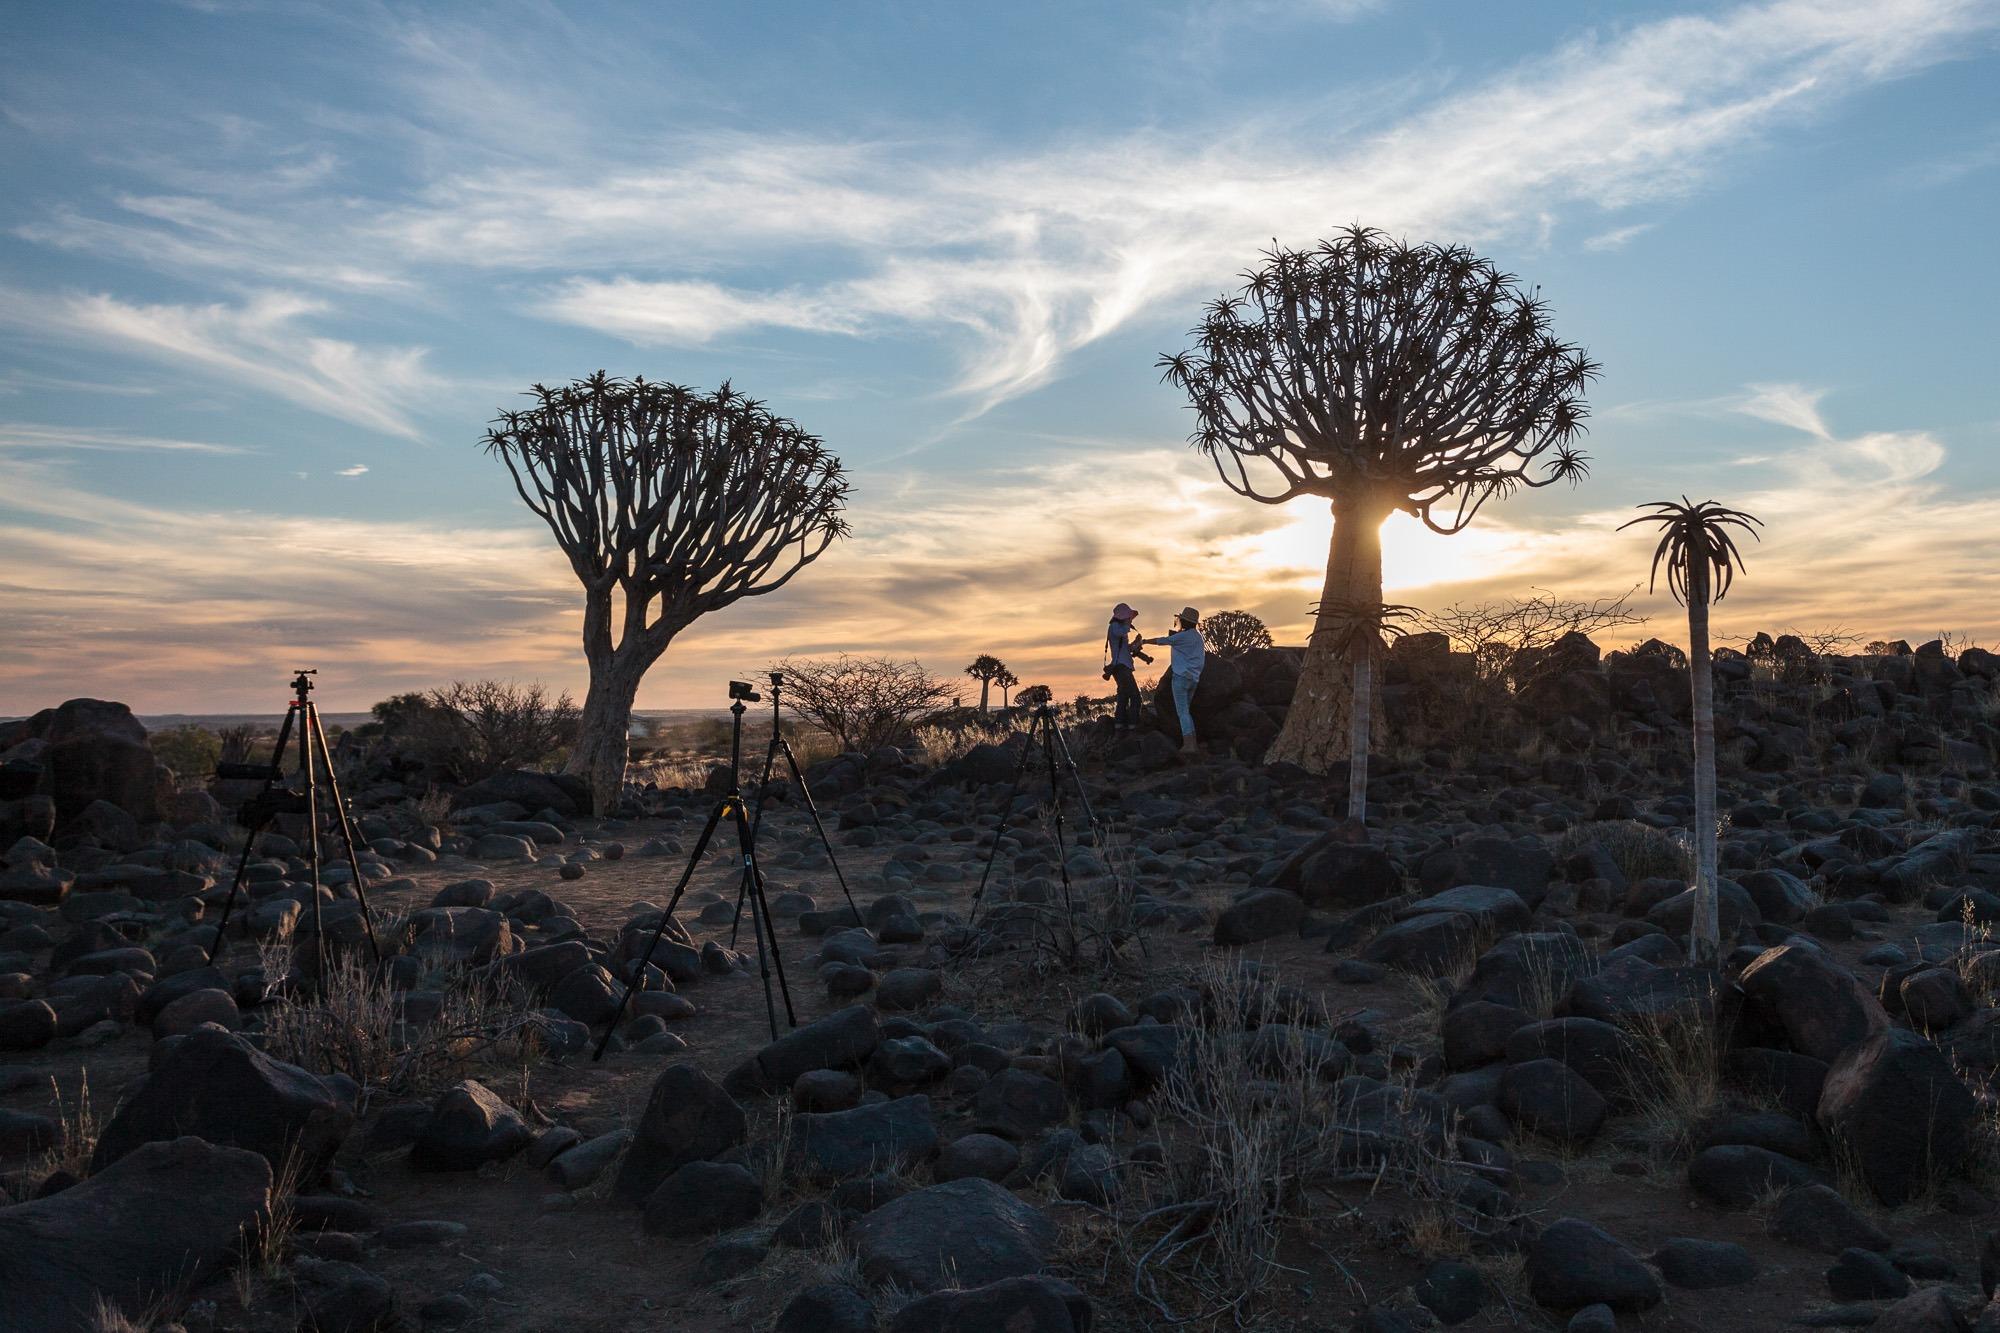 Stative im Quivertree Forest Köcherbaumwald Keetmanshoop Namibia